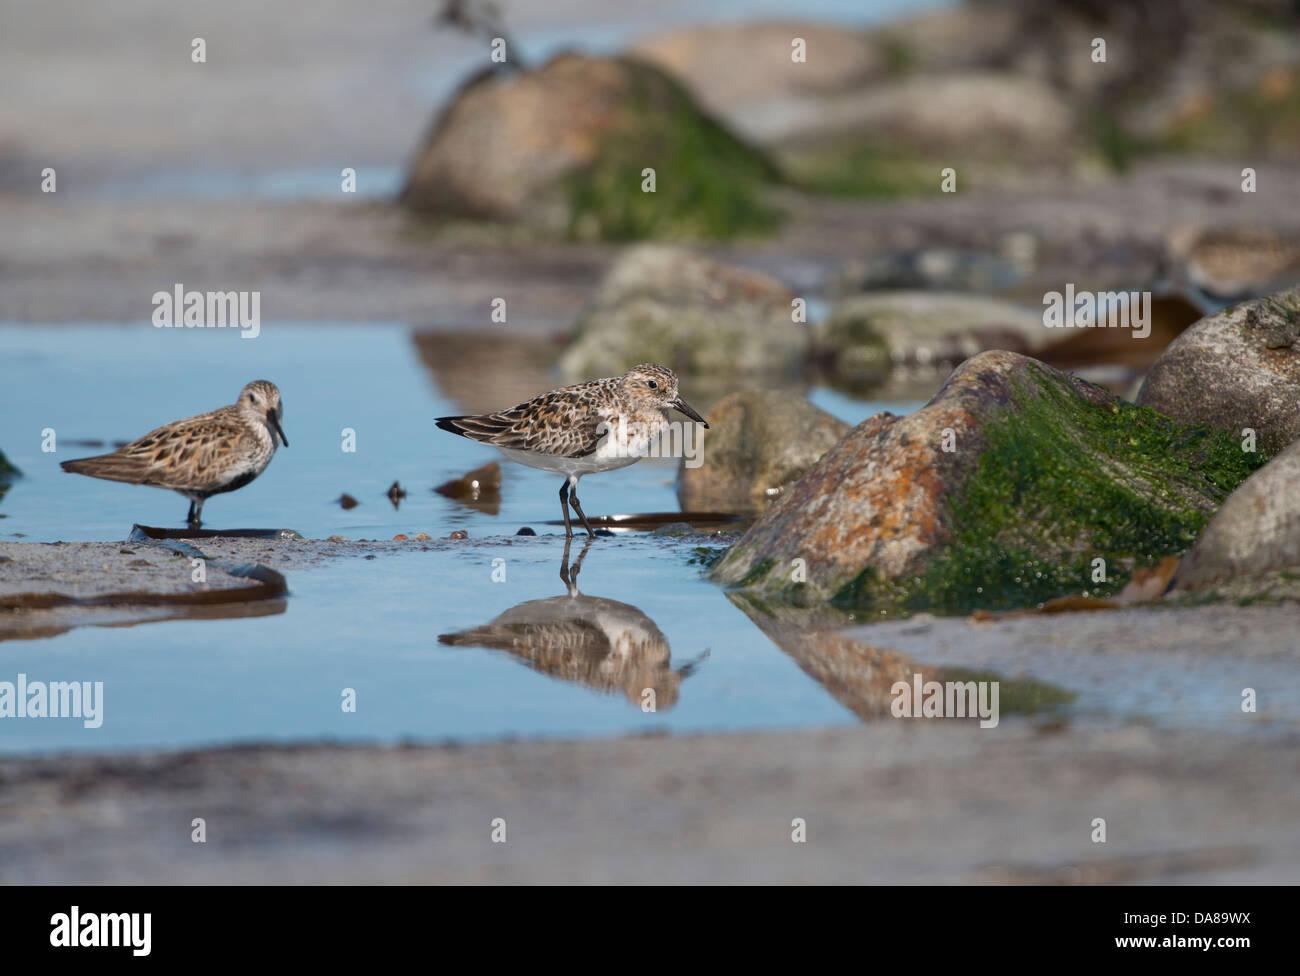 Calidris alba,Sanderling and Calidris alpina, Dunlin  in summer plumage, feeding on beach - Stock Image